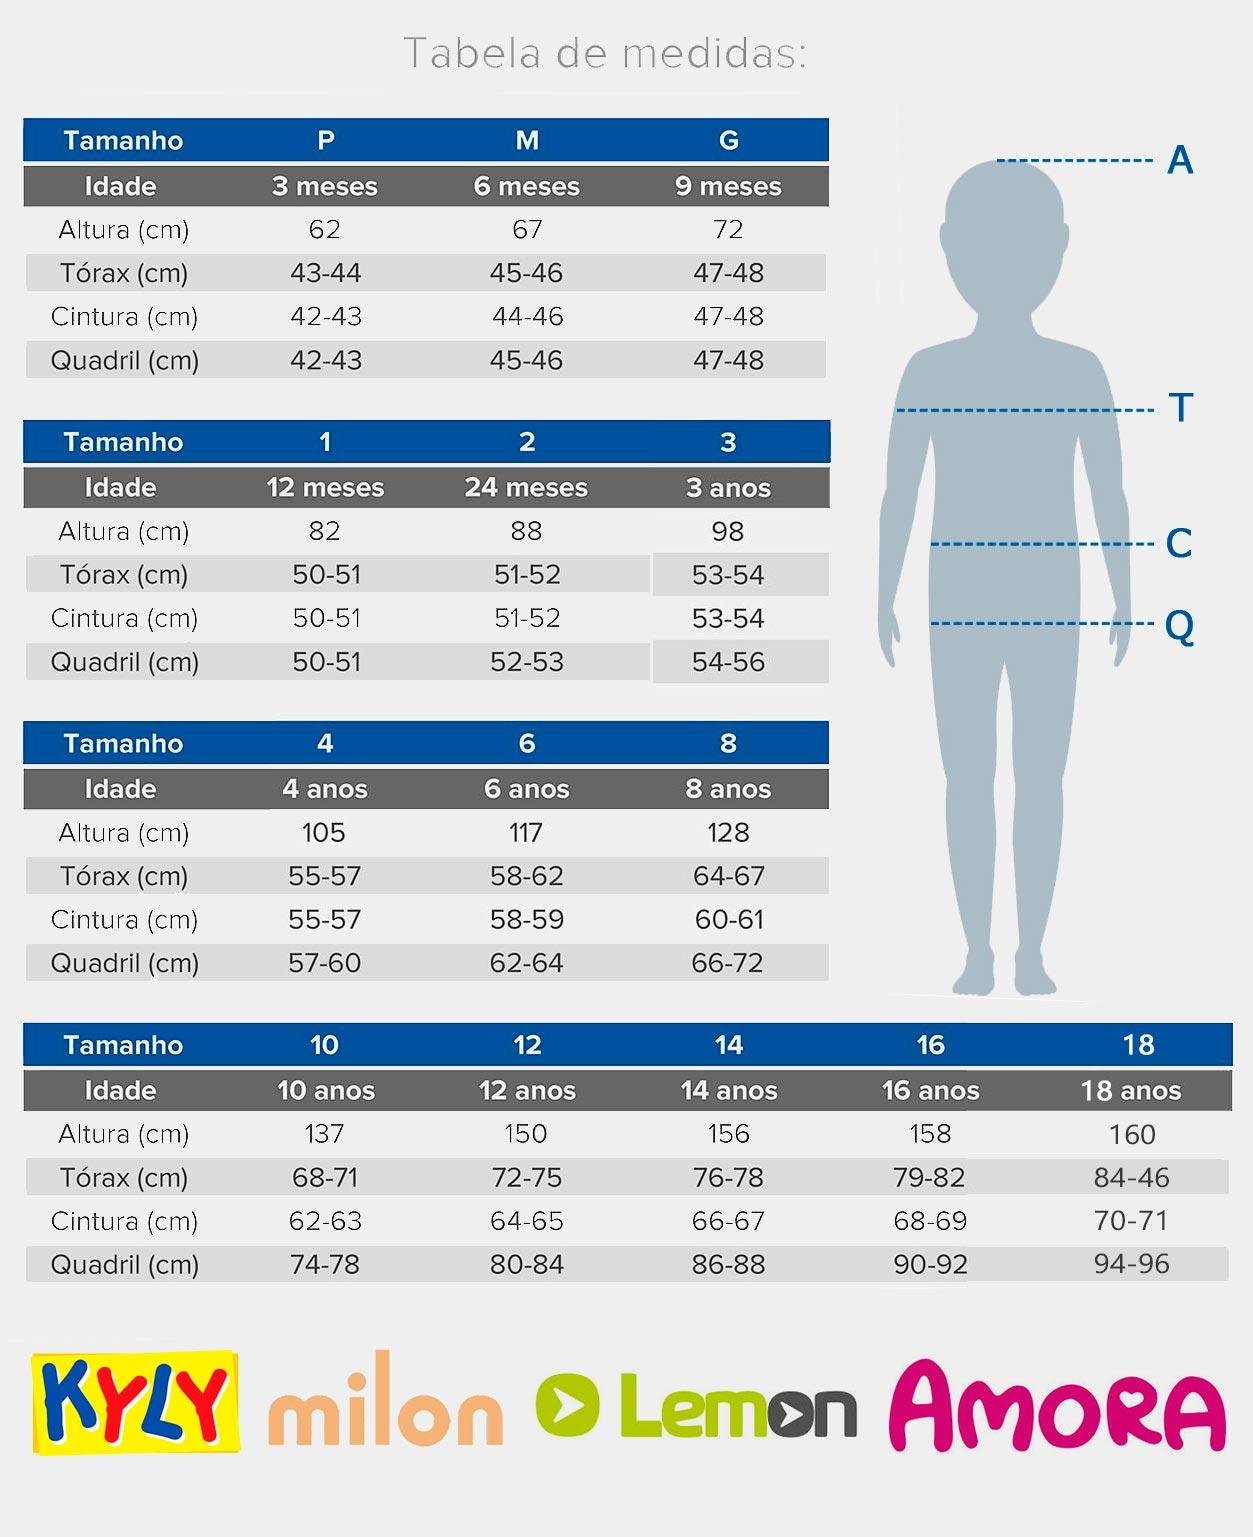 Conjunto Infantil Masculino Verão Cinza Summer Explorer - Kyly: Tabela de medidas